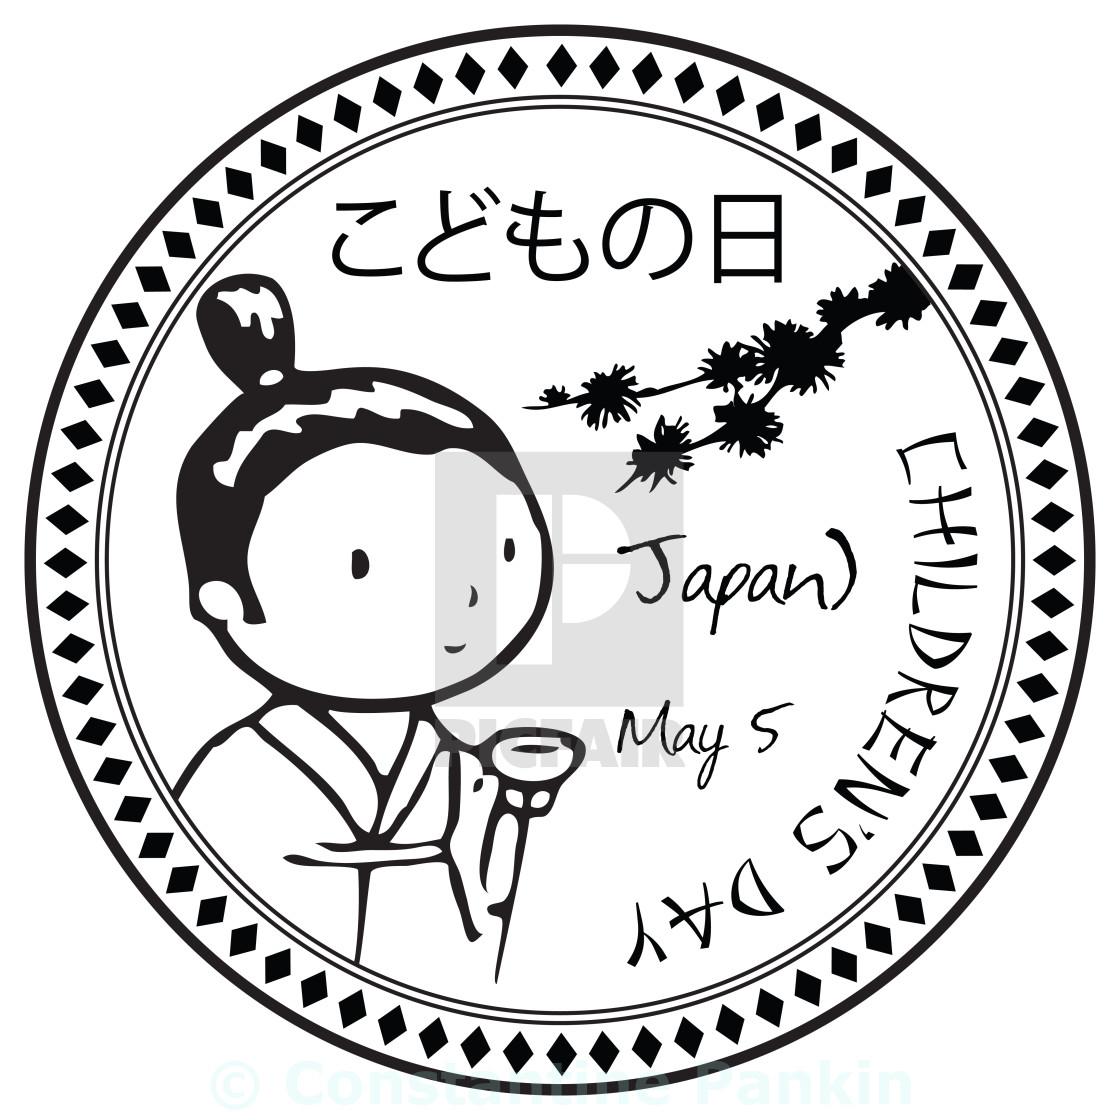 Childrens Day clipart - Japan, Text, Product, transparent clip art